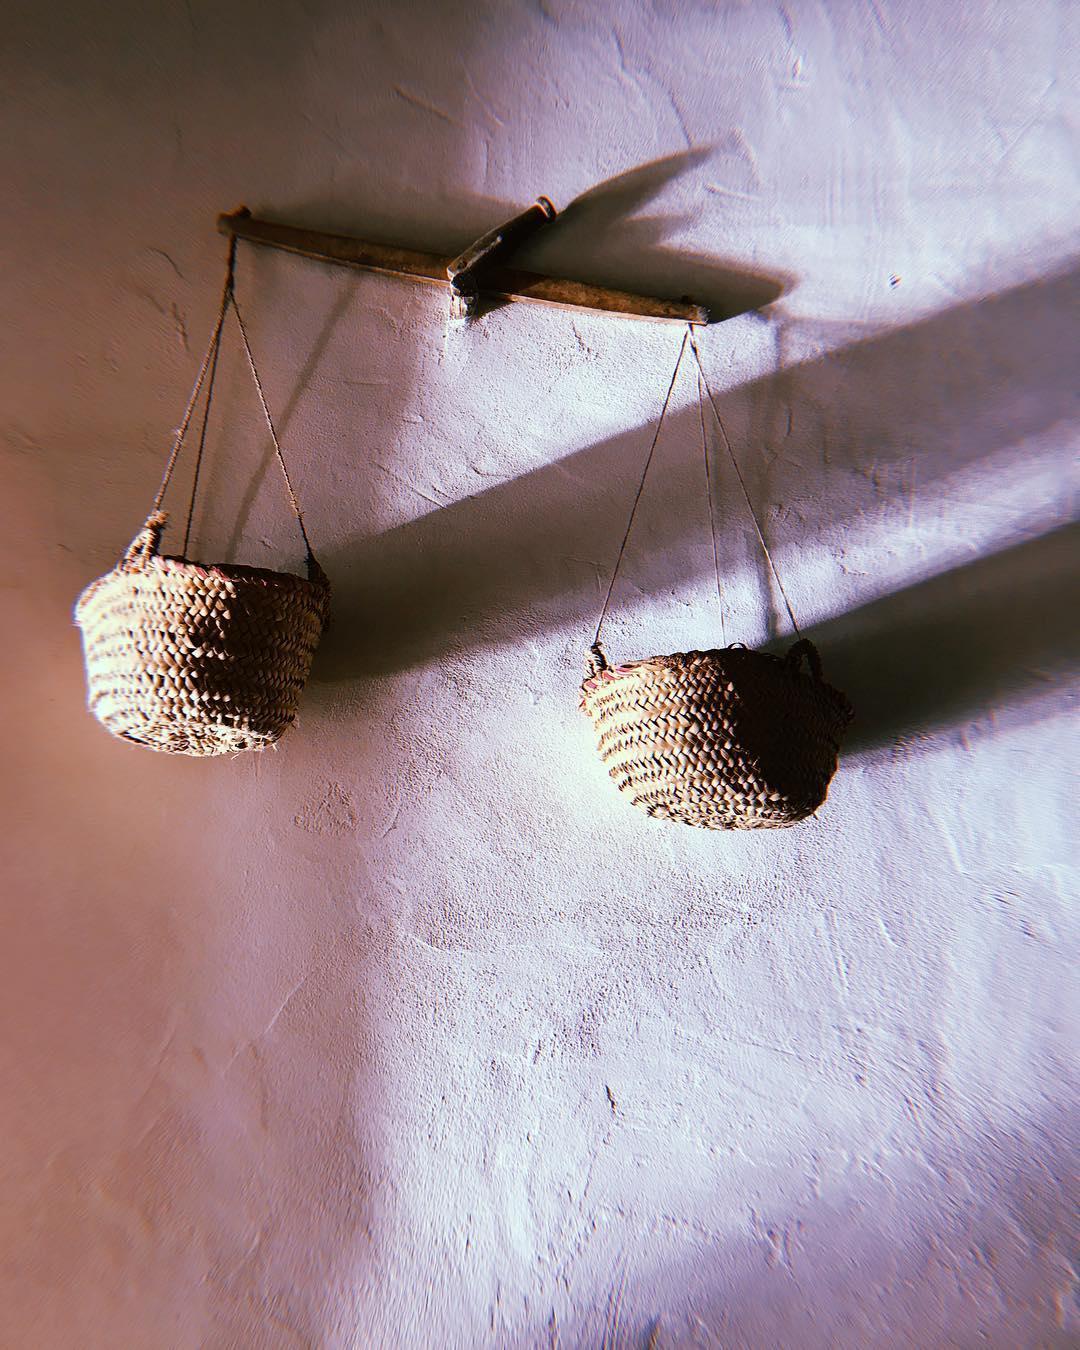 // ⚖️ // #lascicadasibiza #finca #ibizenca #rustica #payes #interiors #minimal #elegance #boutiquevilla #realibizastyle #farmhouse #baskets #rustic #charm